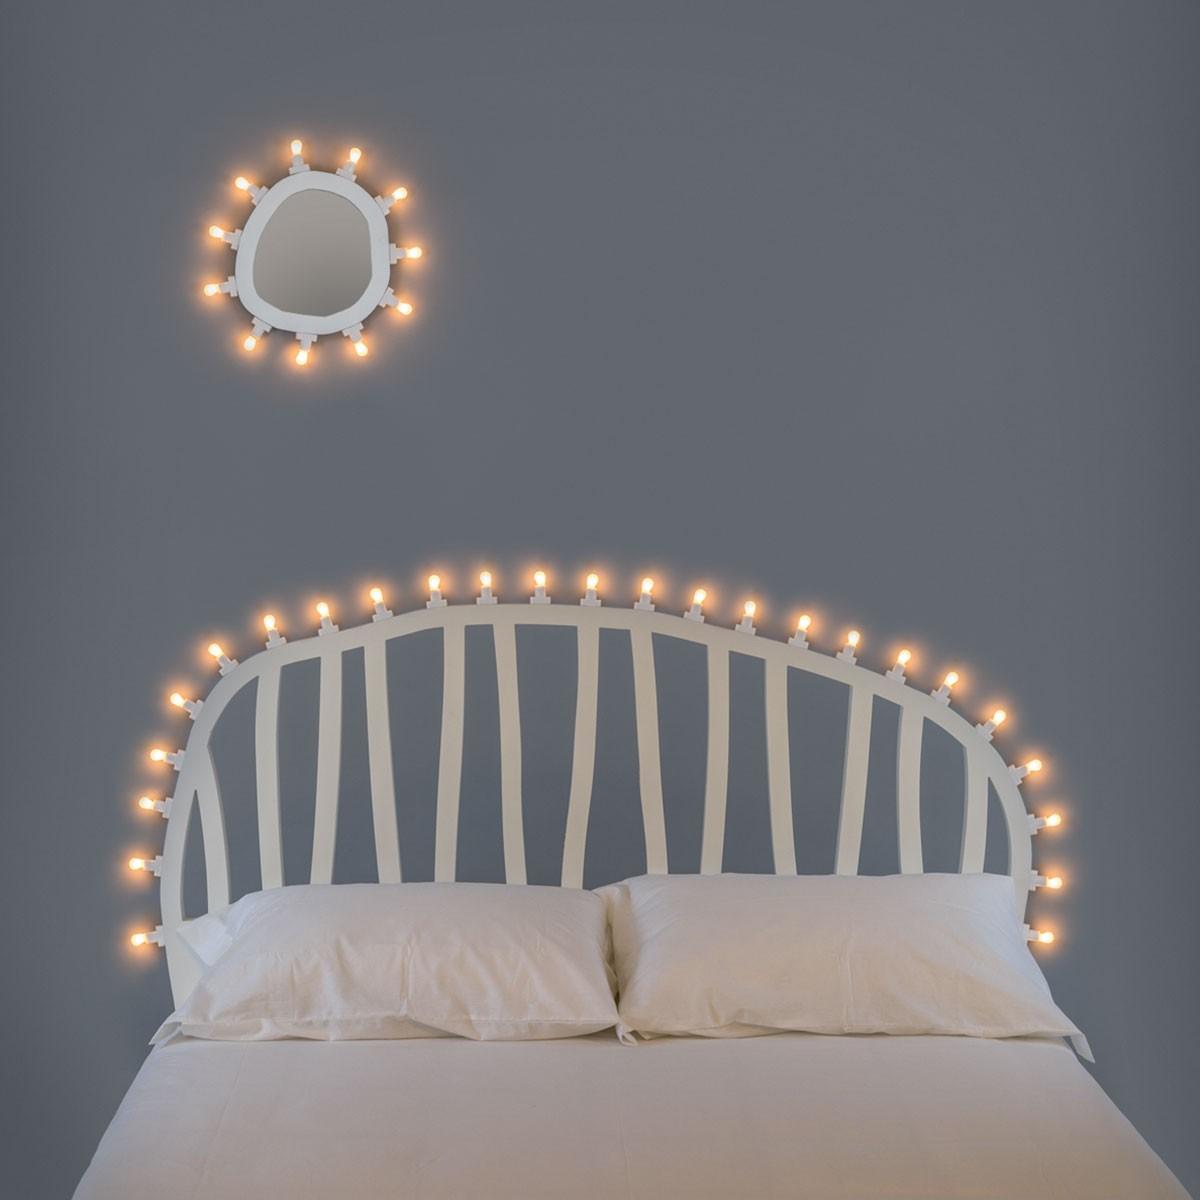 Seletti invente la tête de lit lumineuse dans la collection ...